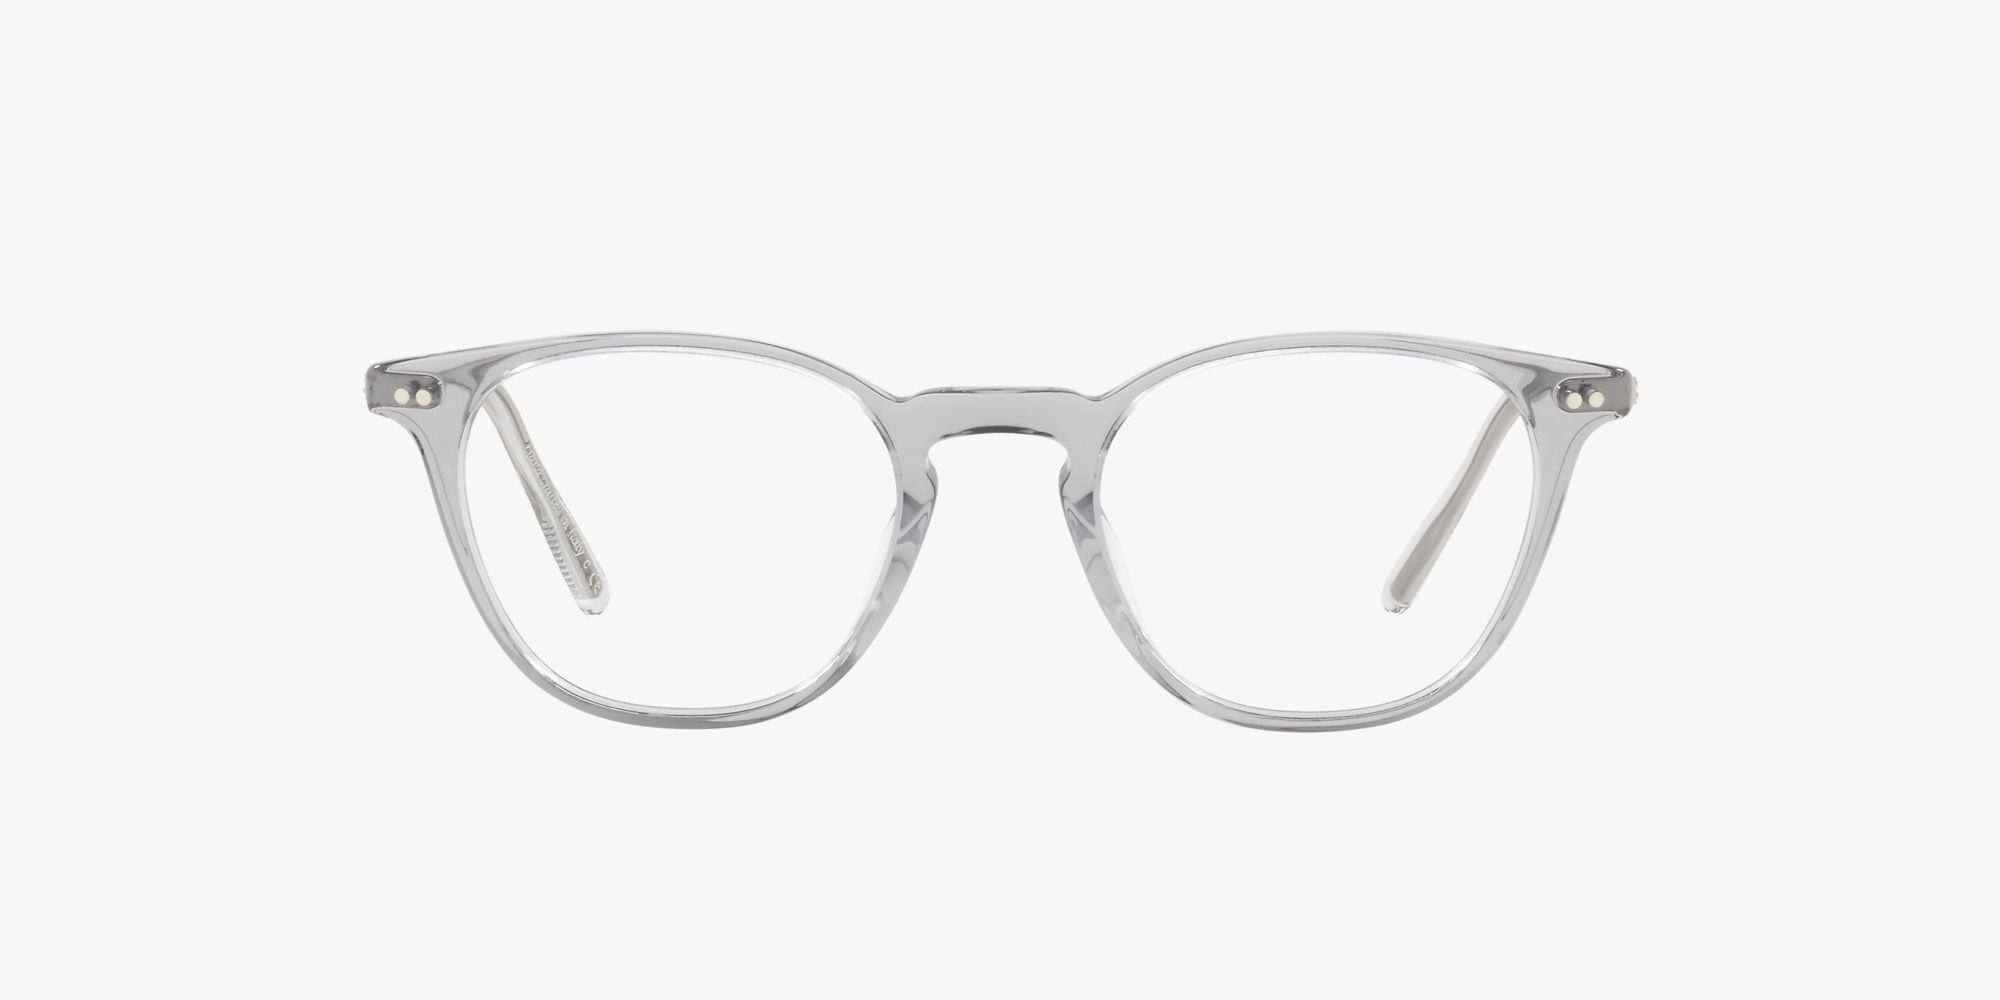 62c52a52cbd Collections OV5361U - Workman Grey - Demo Lens - Acetate